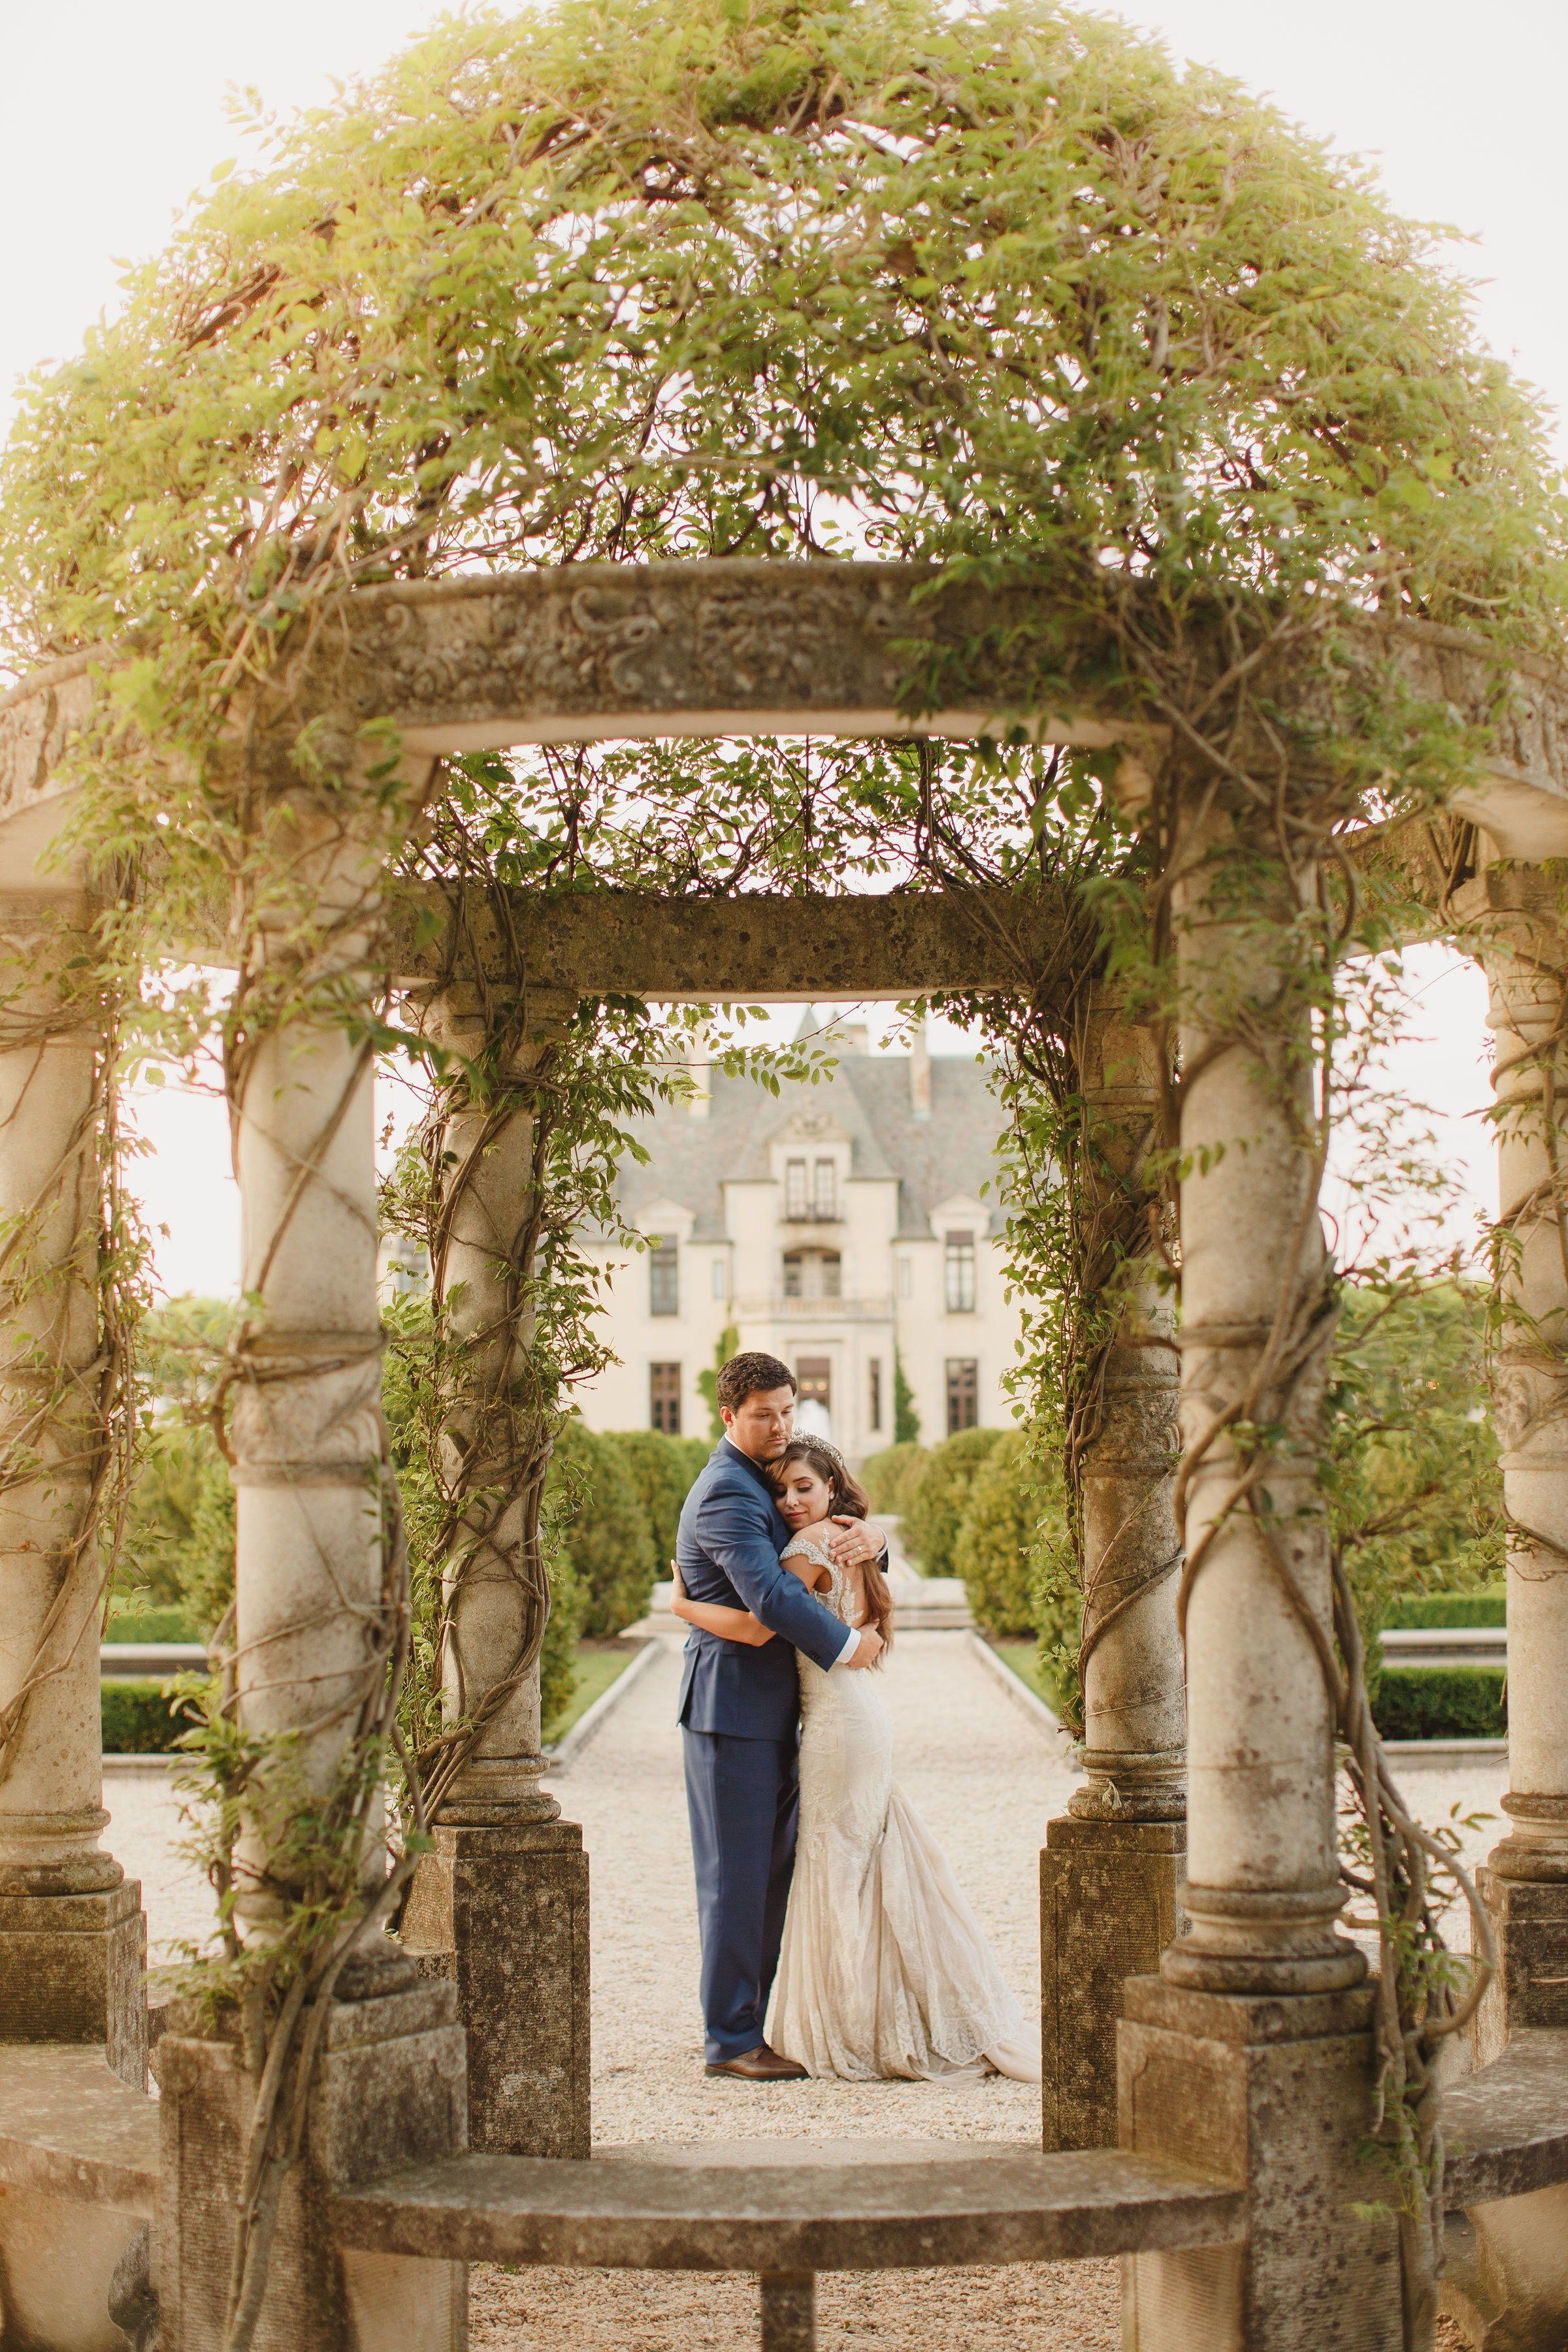 Pin By Oheka Castle On Oheka Castle Wedding Inspiration In 2020 Castle Wedding Inspiration Oheka Castle Fairytale Wedding Theme